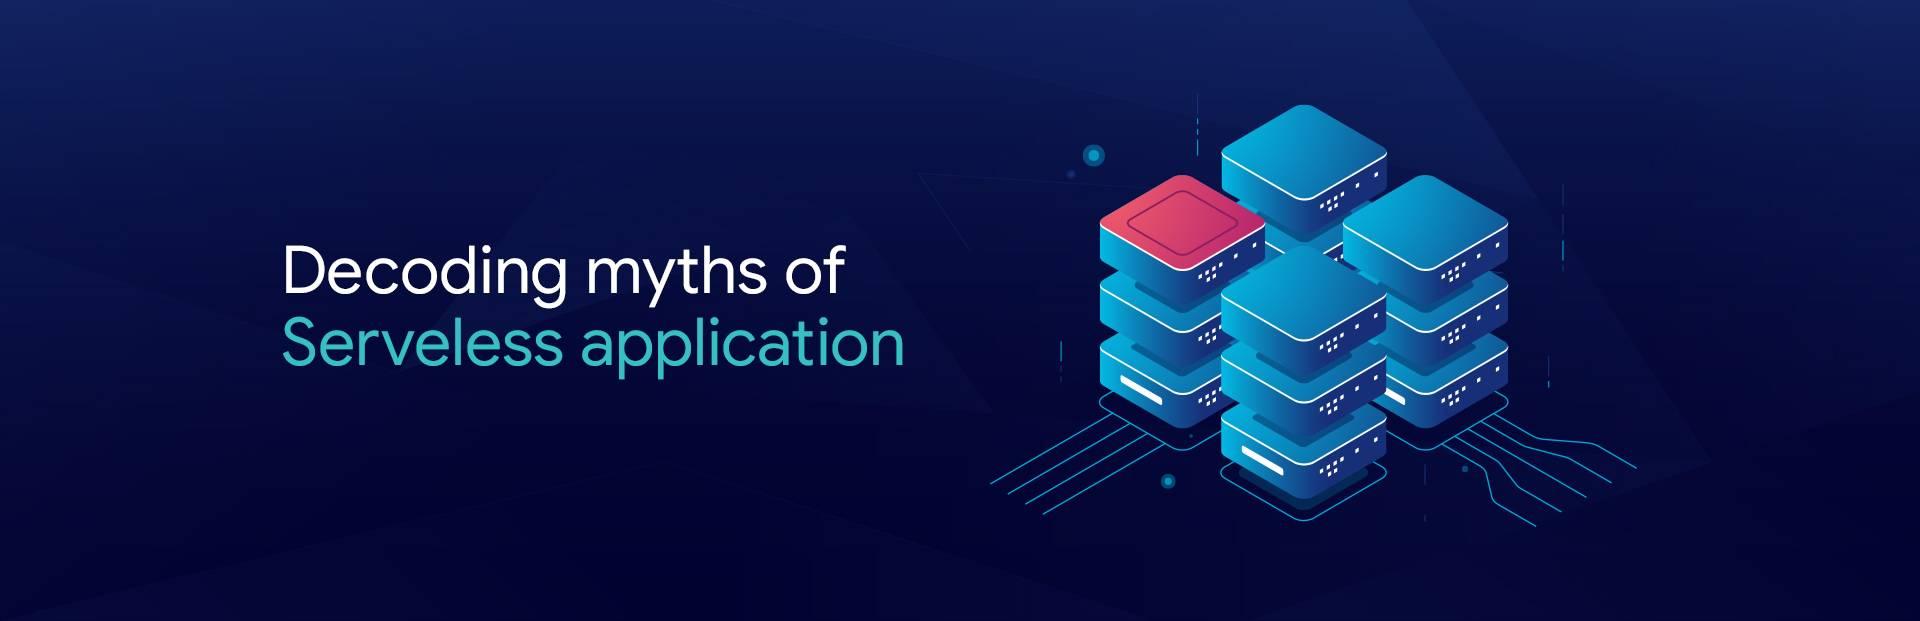 Decoding Myths of Serverless application